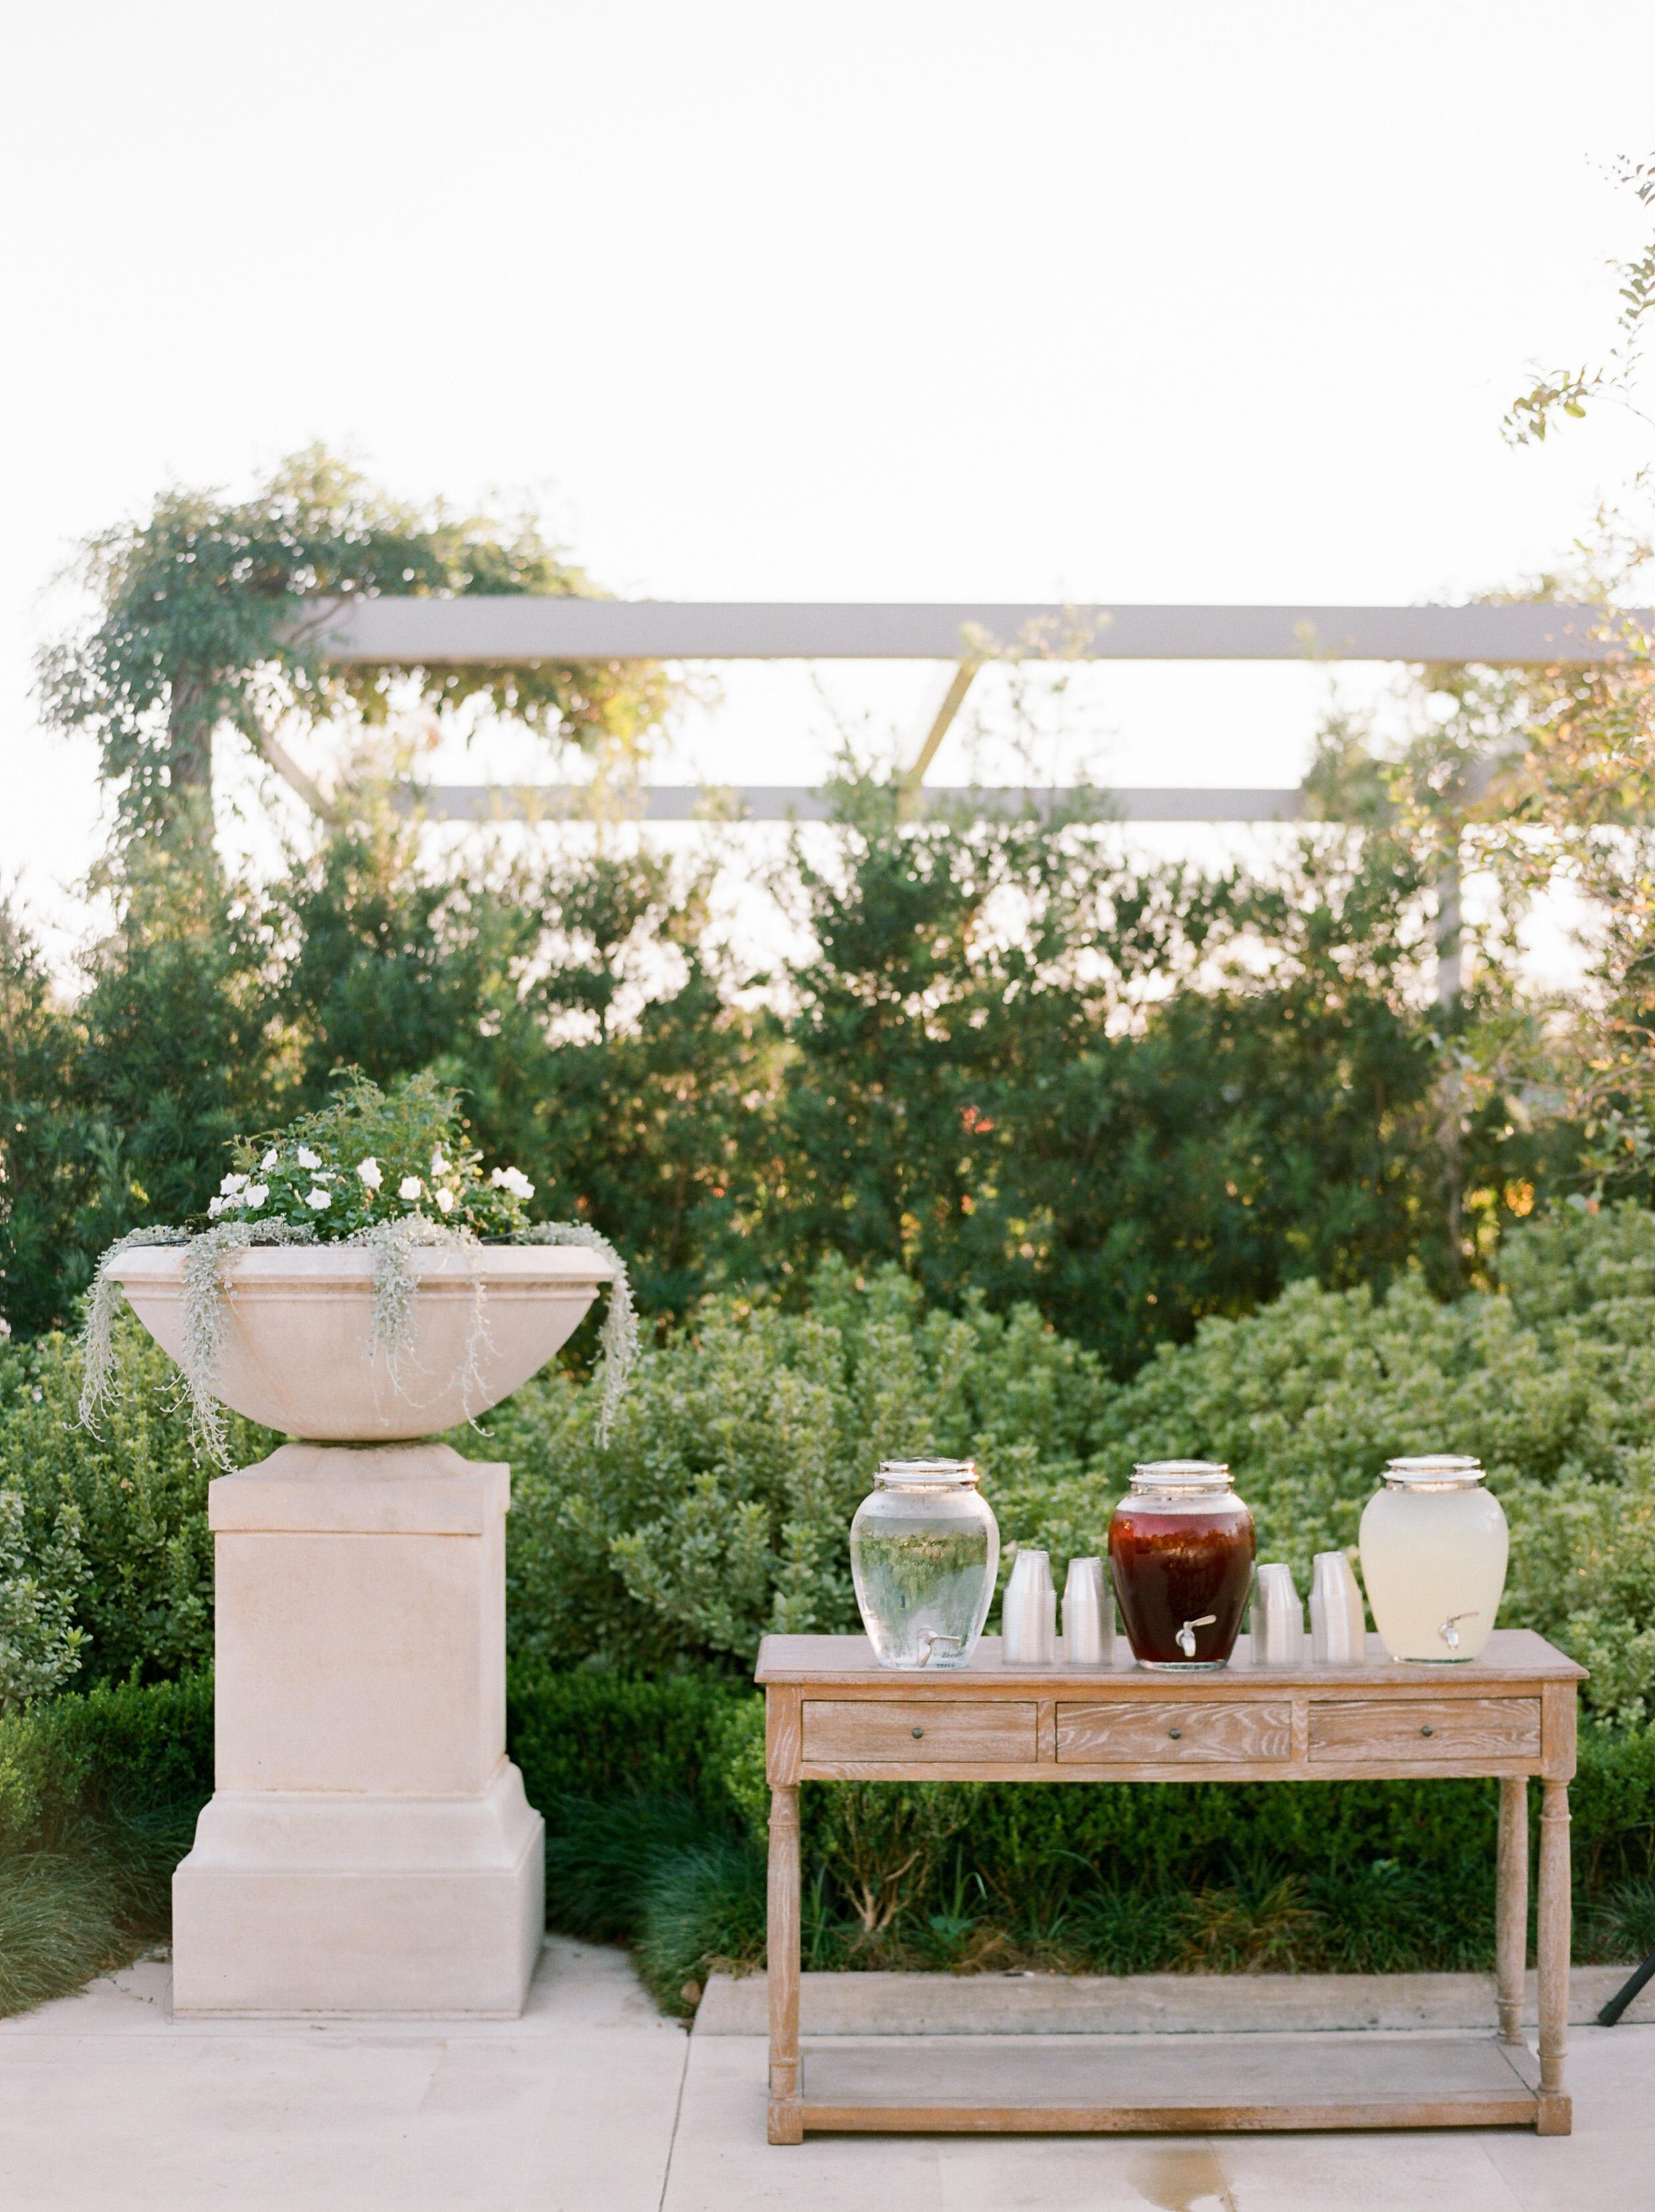 Martha-Stewart-Wedding-Dana-Fernandez-Photography-Josh-Texas-Film-Houston-Wedding-Fine-Art-Photographer-McGovern-Centennial-Gardens-Top-Best-113.jpg